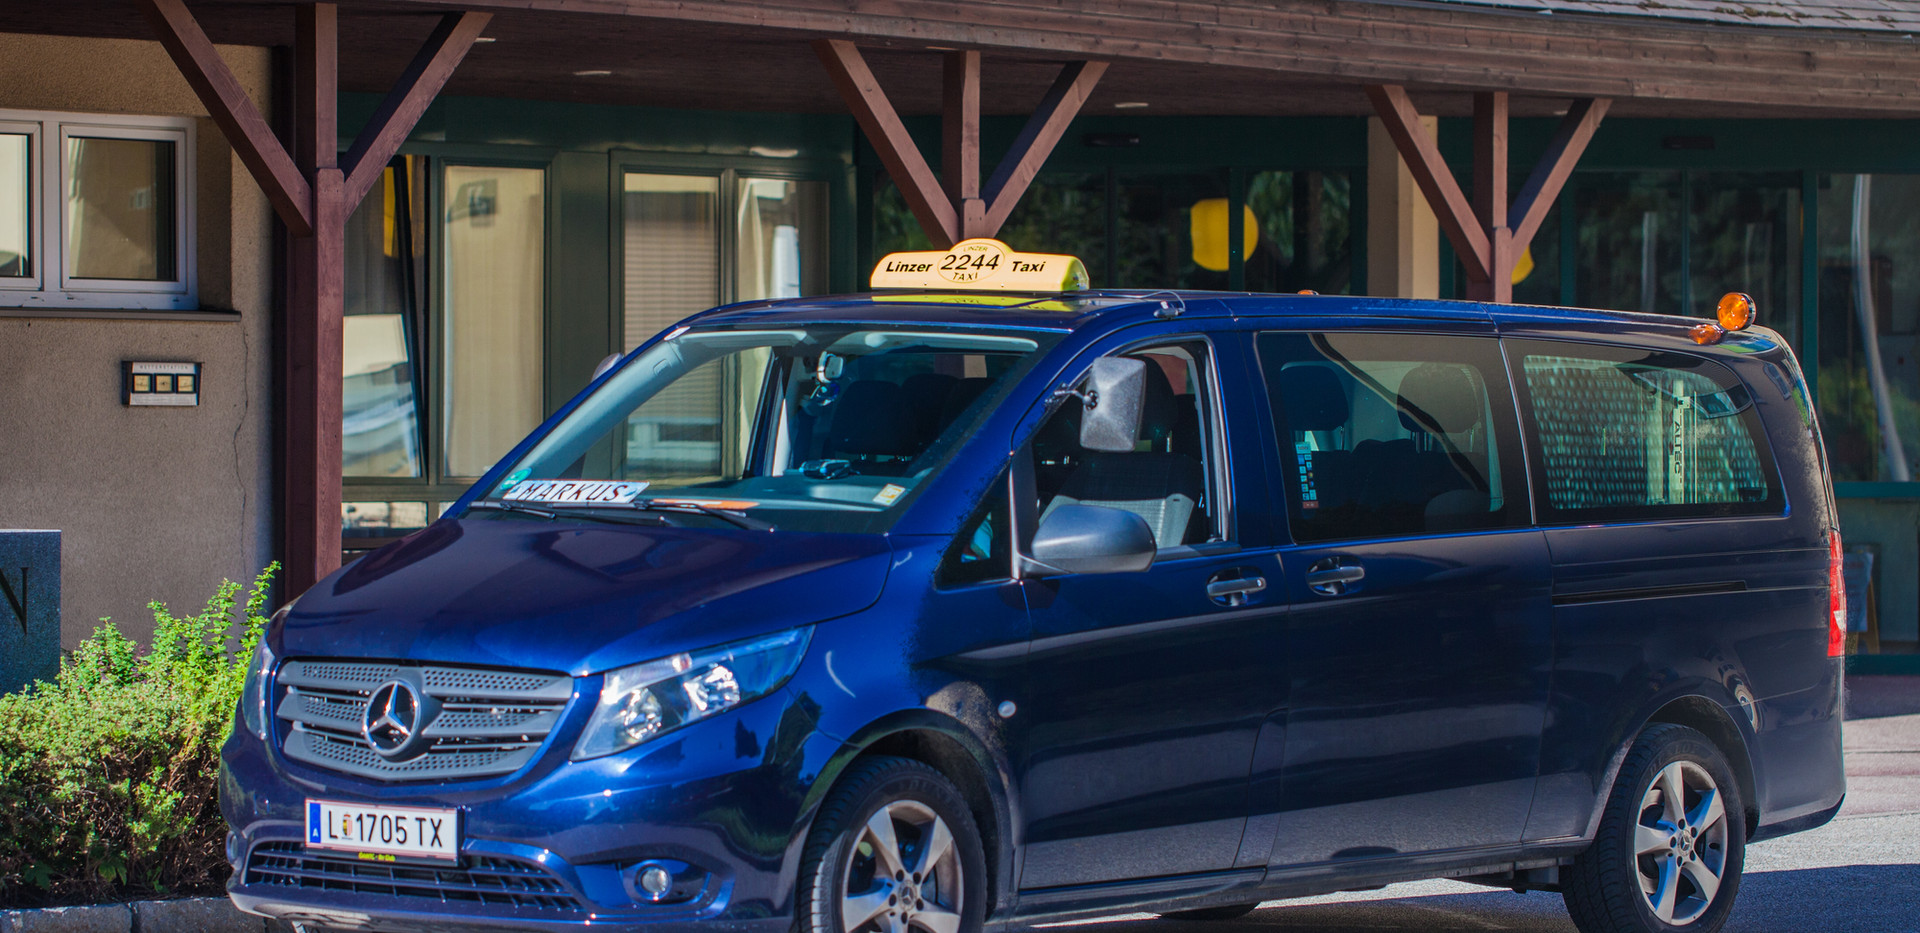 _MG_8983Taxi - PolFilter+MG8988 Taxi.jpg